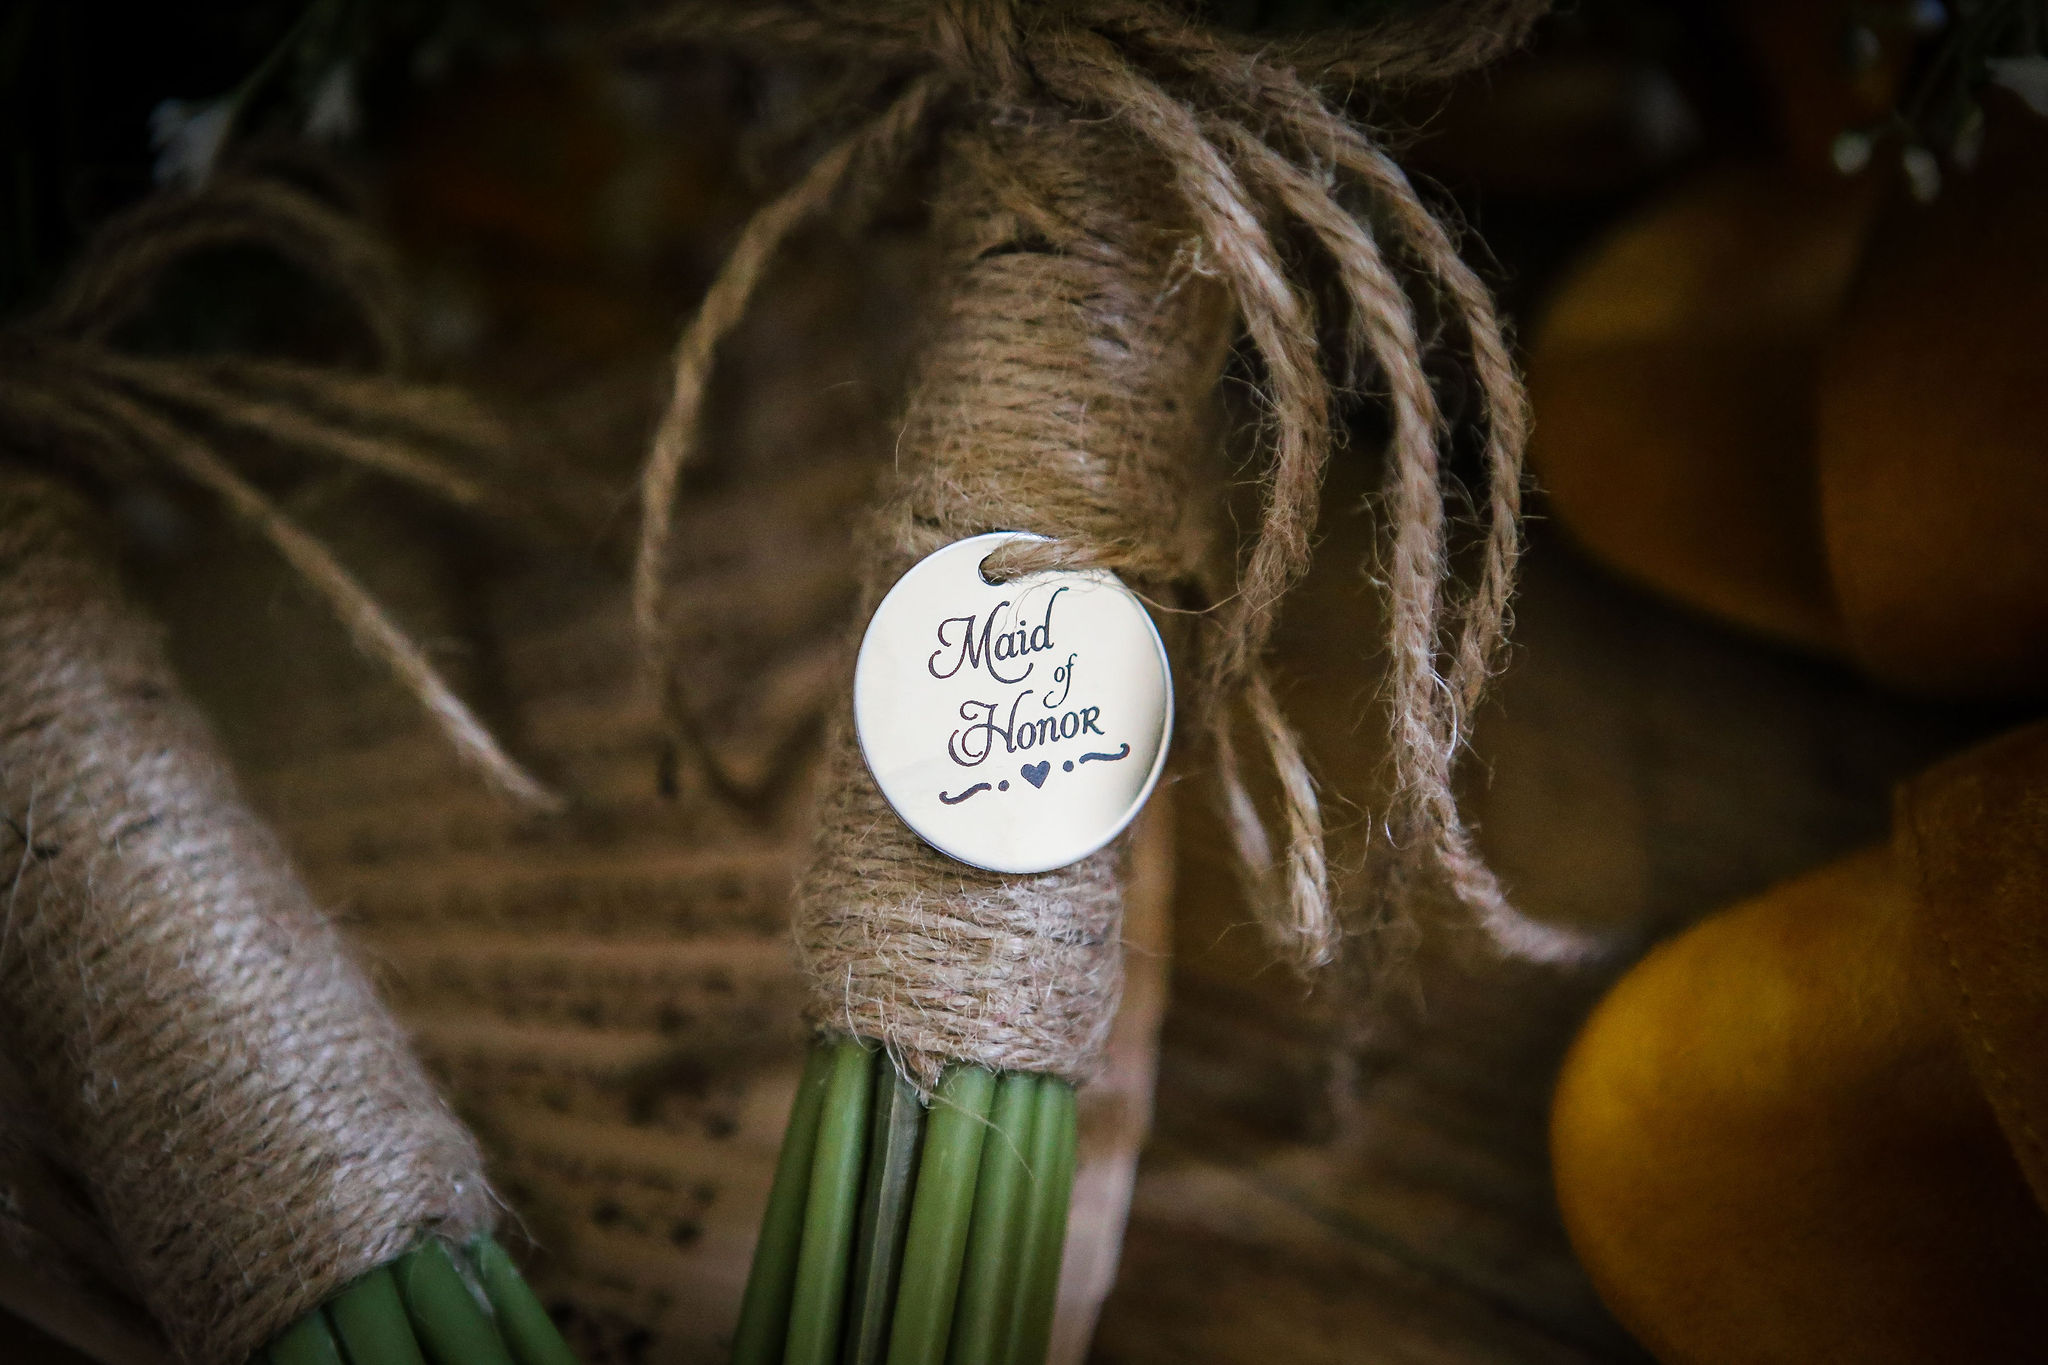 Harriet&Rhys Wedding - maid of honour bouquet detail